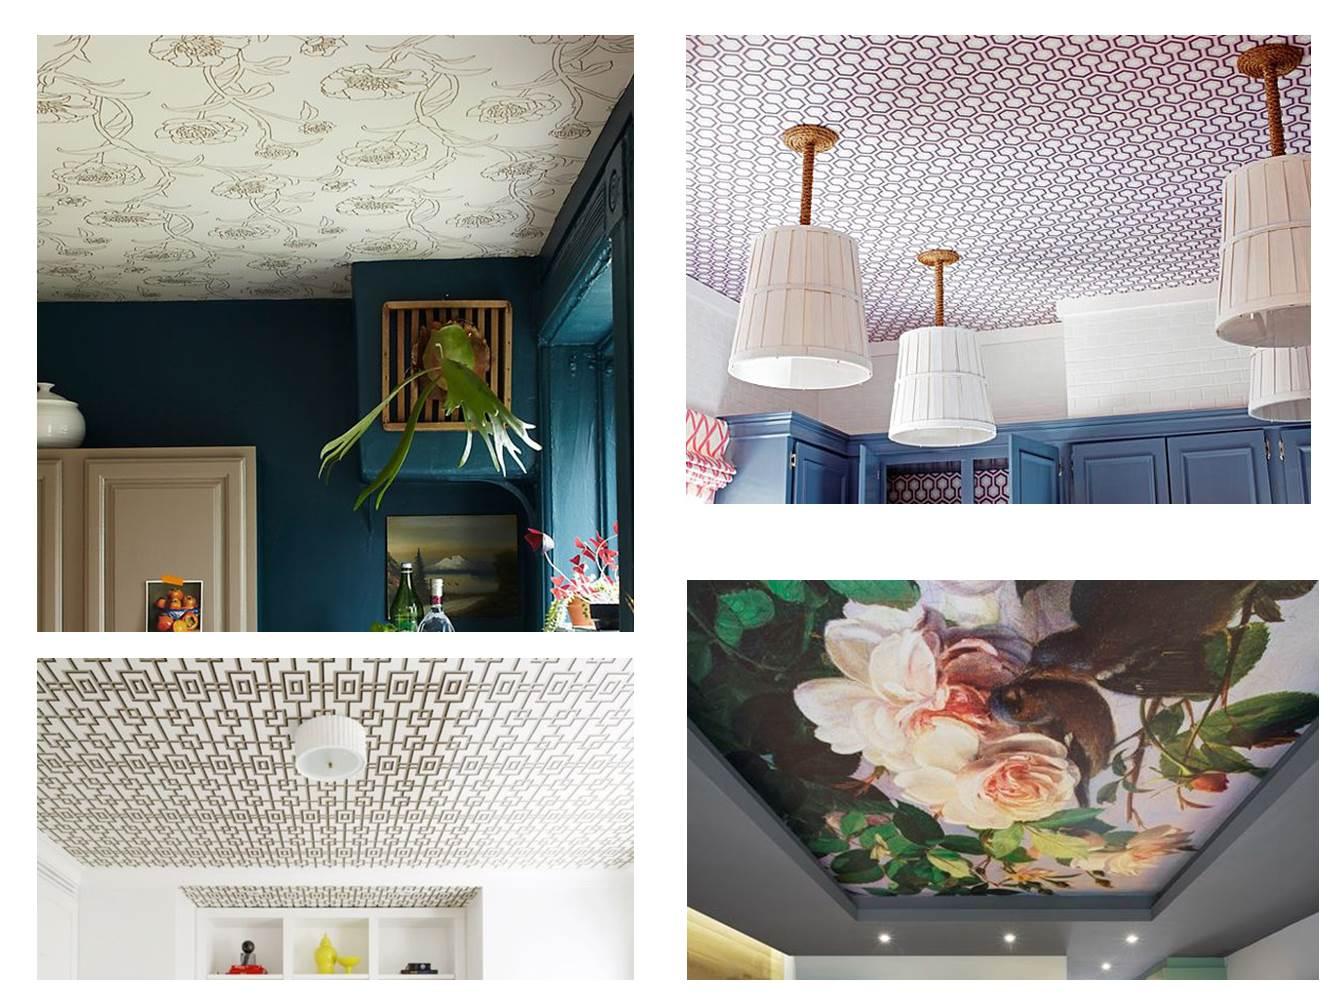 24 Ceiling Wallpaper Pattern Flowers Geometric Interiors Blog Restless Design